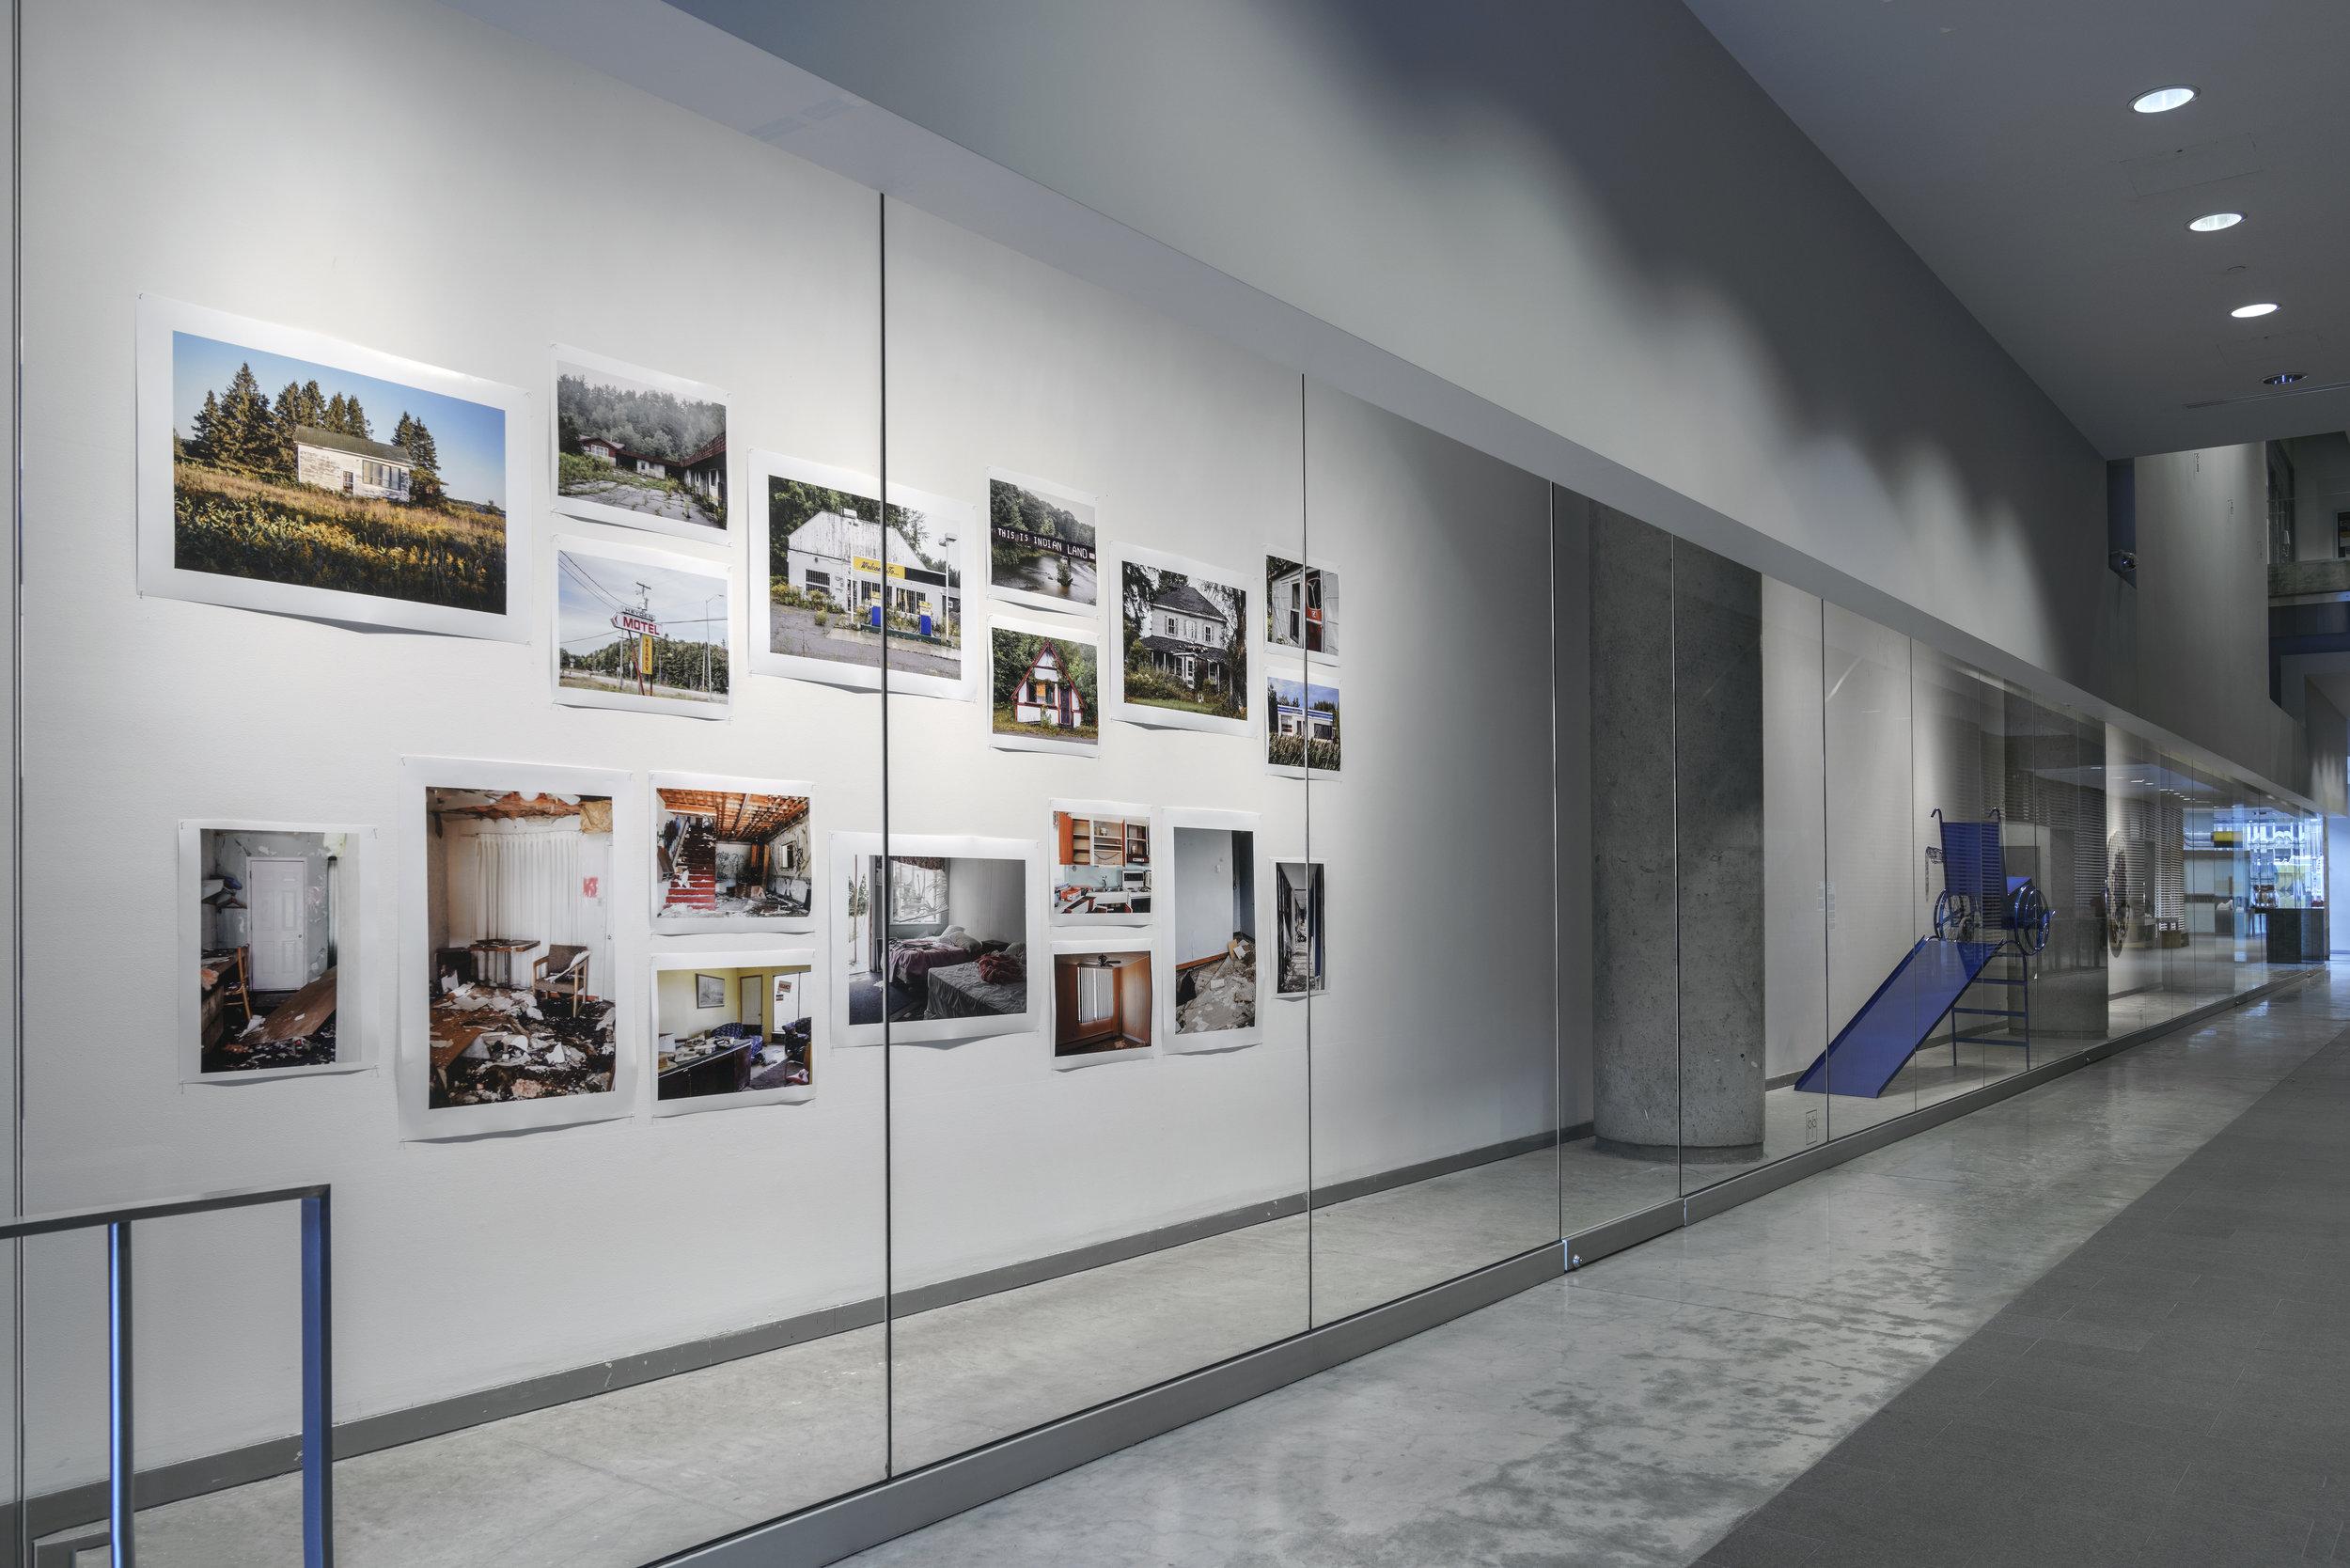 FOFA Gallery